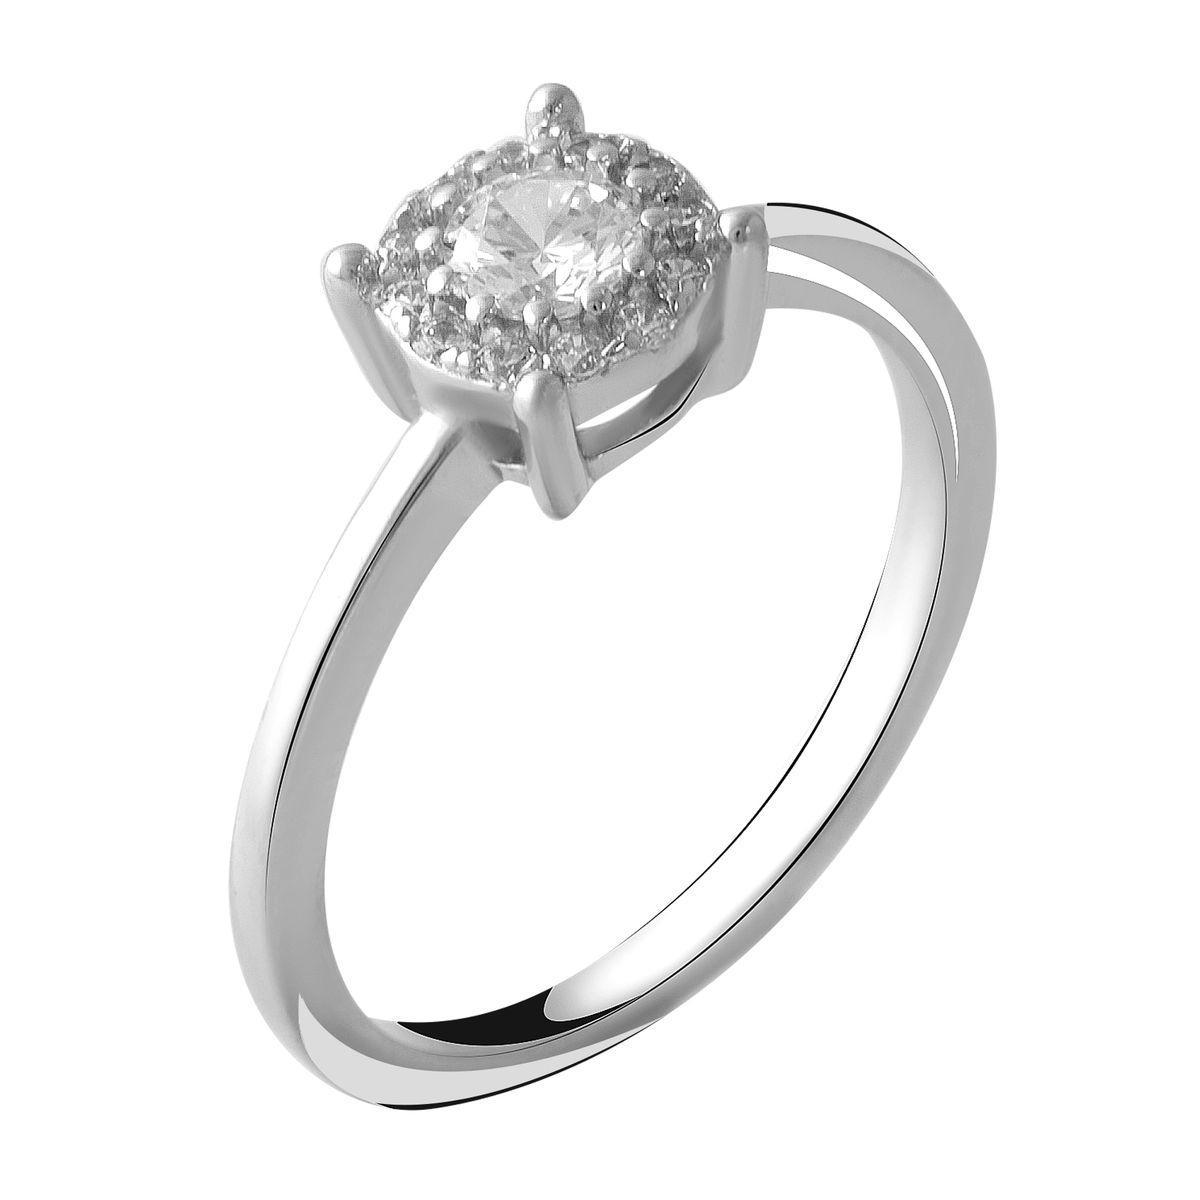 Серебряное кольцо DreamJewelry с фианитами (2049548) 18 размер